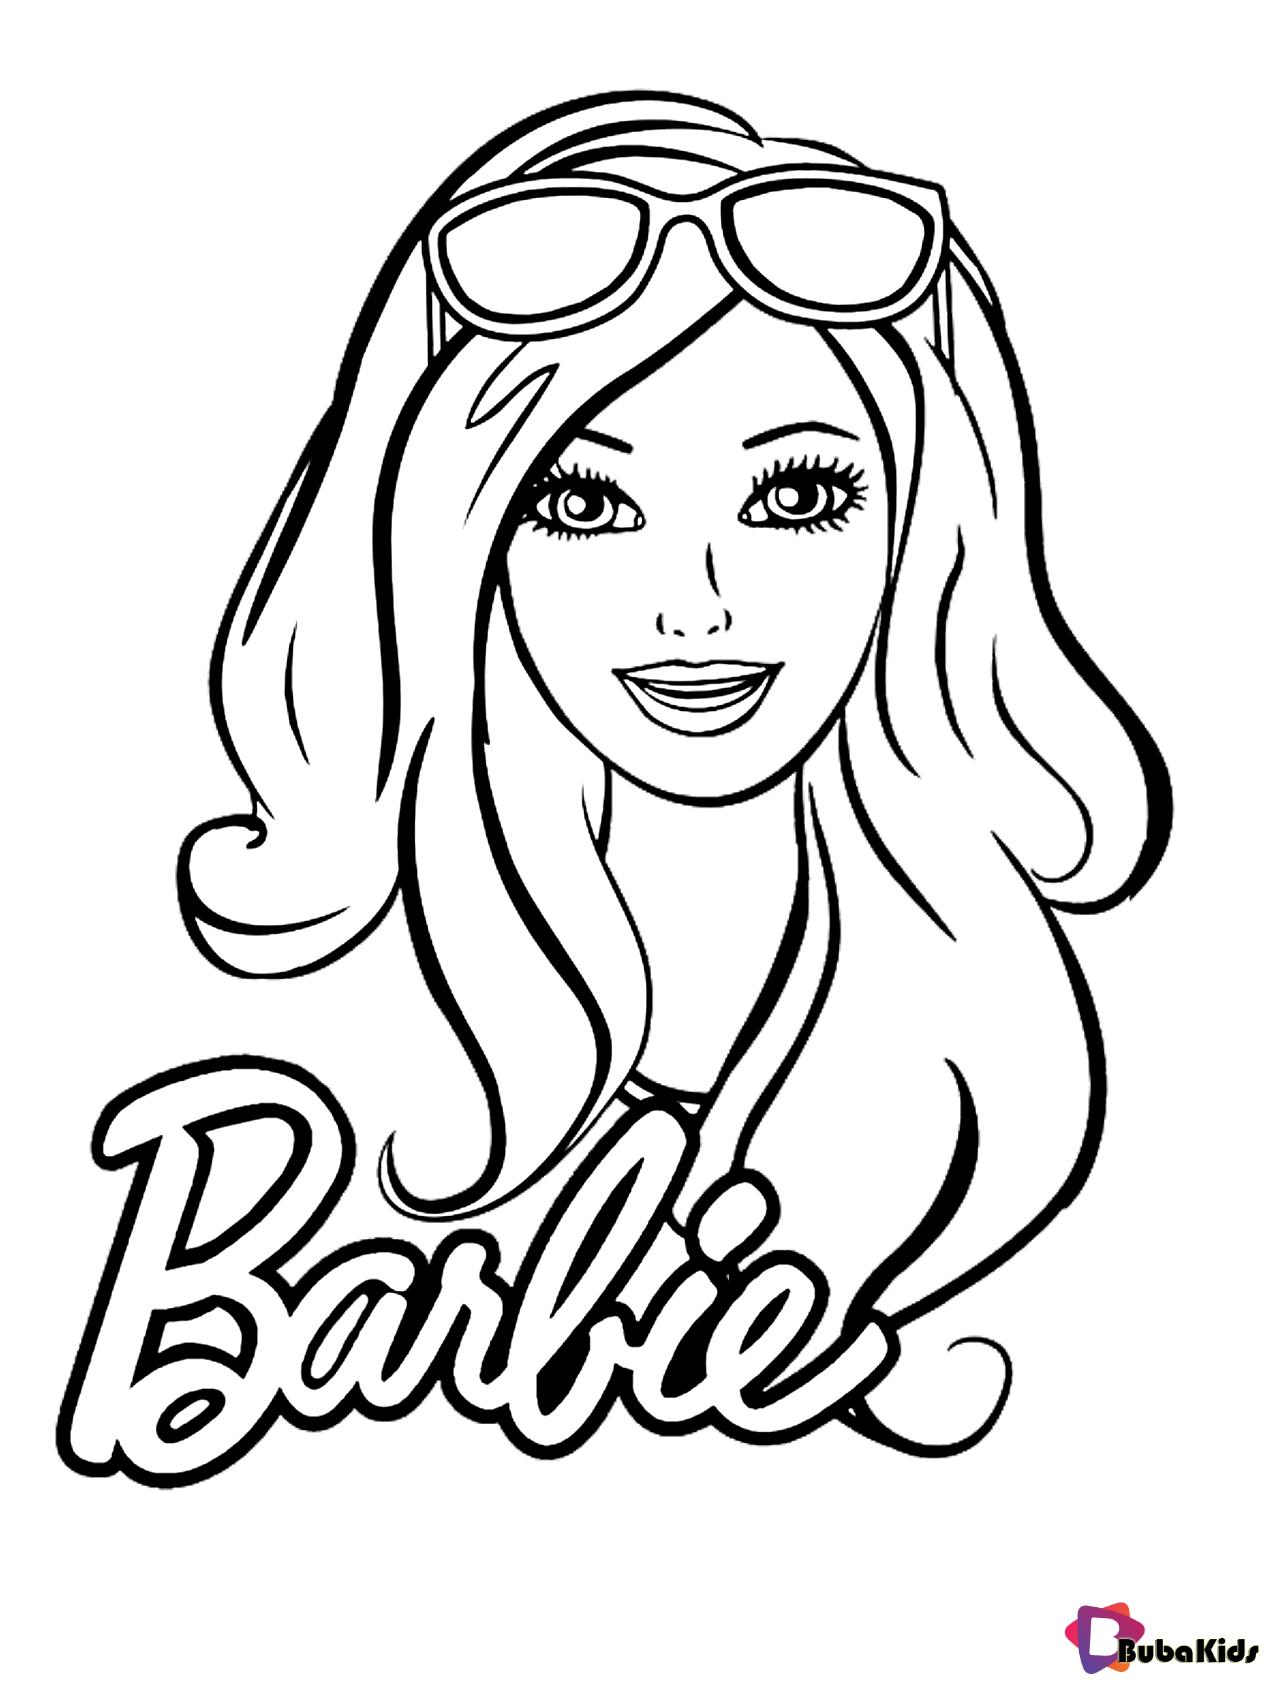 Pin By Tania Lisbeth On Mascaras Barbie Coloring Barbie Coloring Pages Coloring Pages For Girls